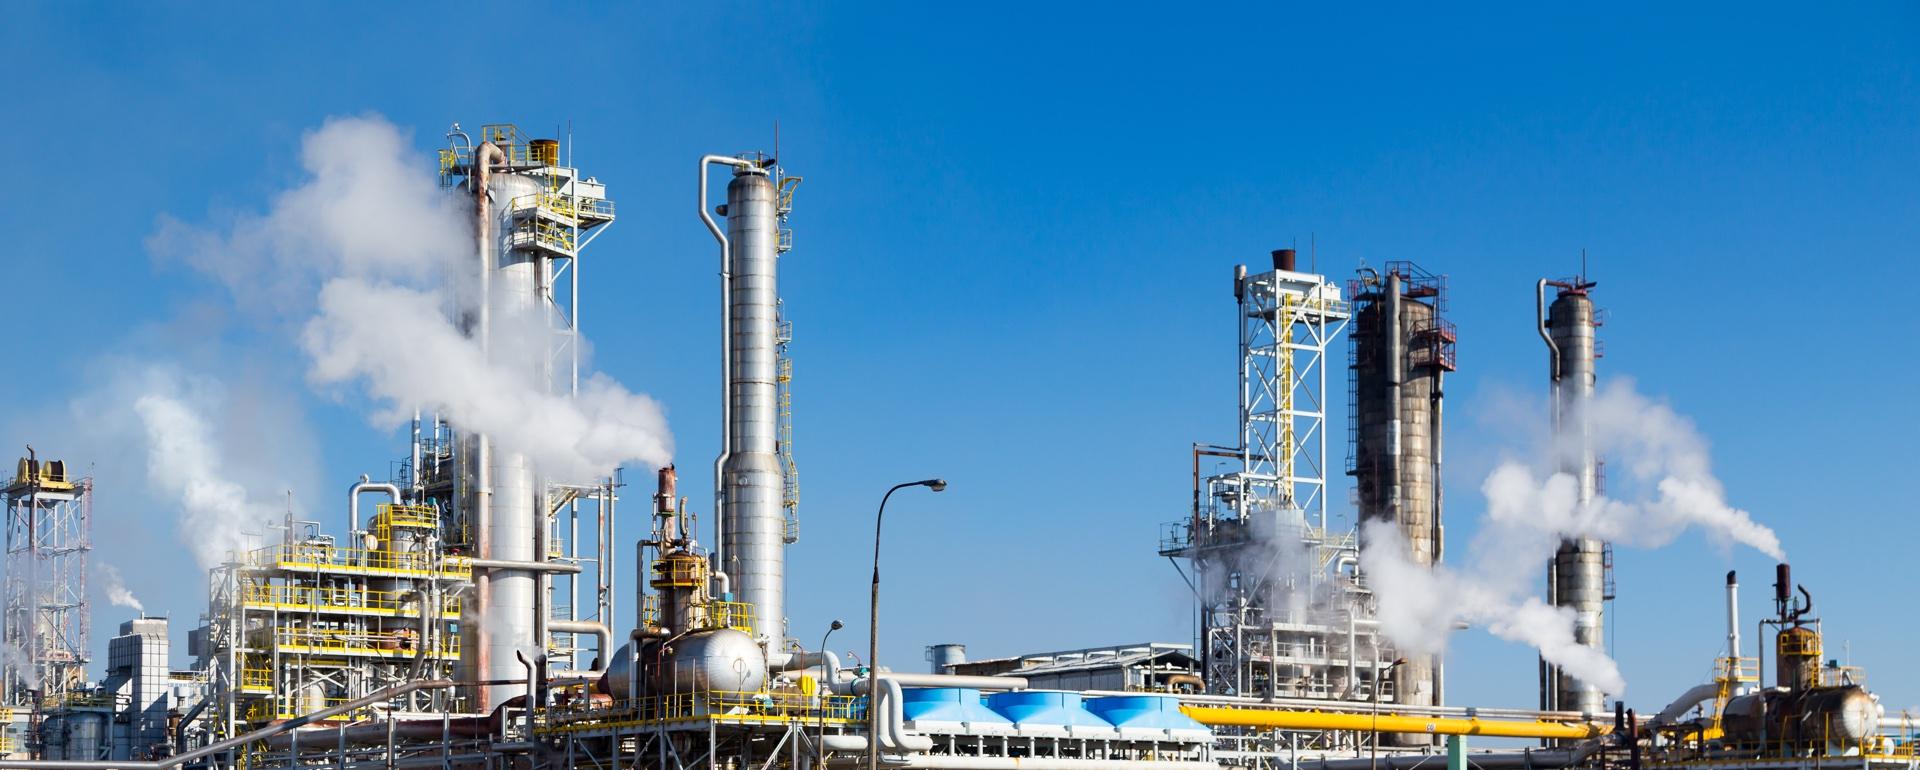 Process Equipment Engineering Since 1959